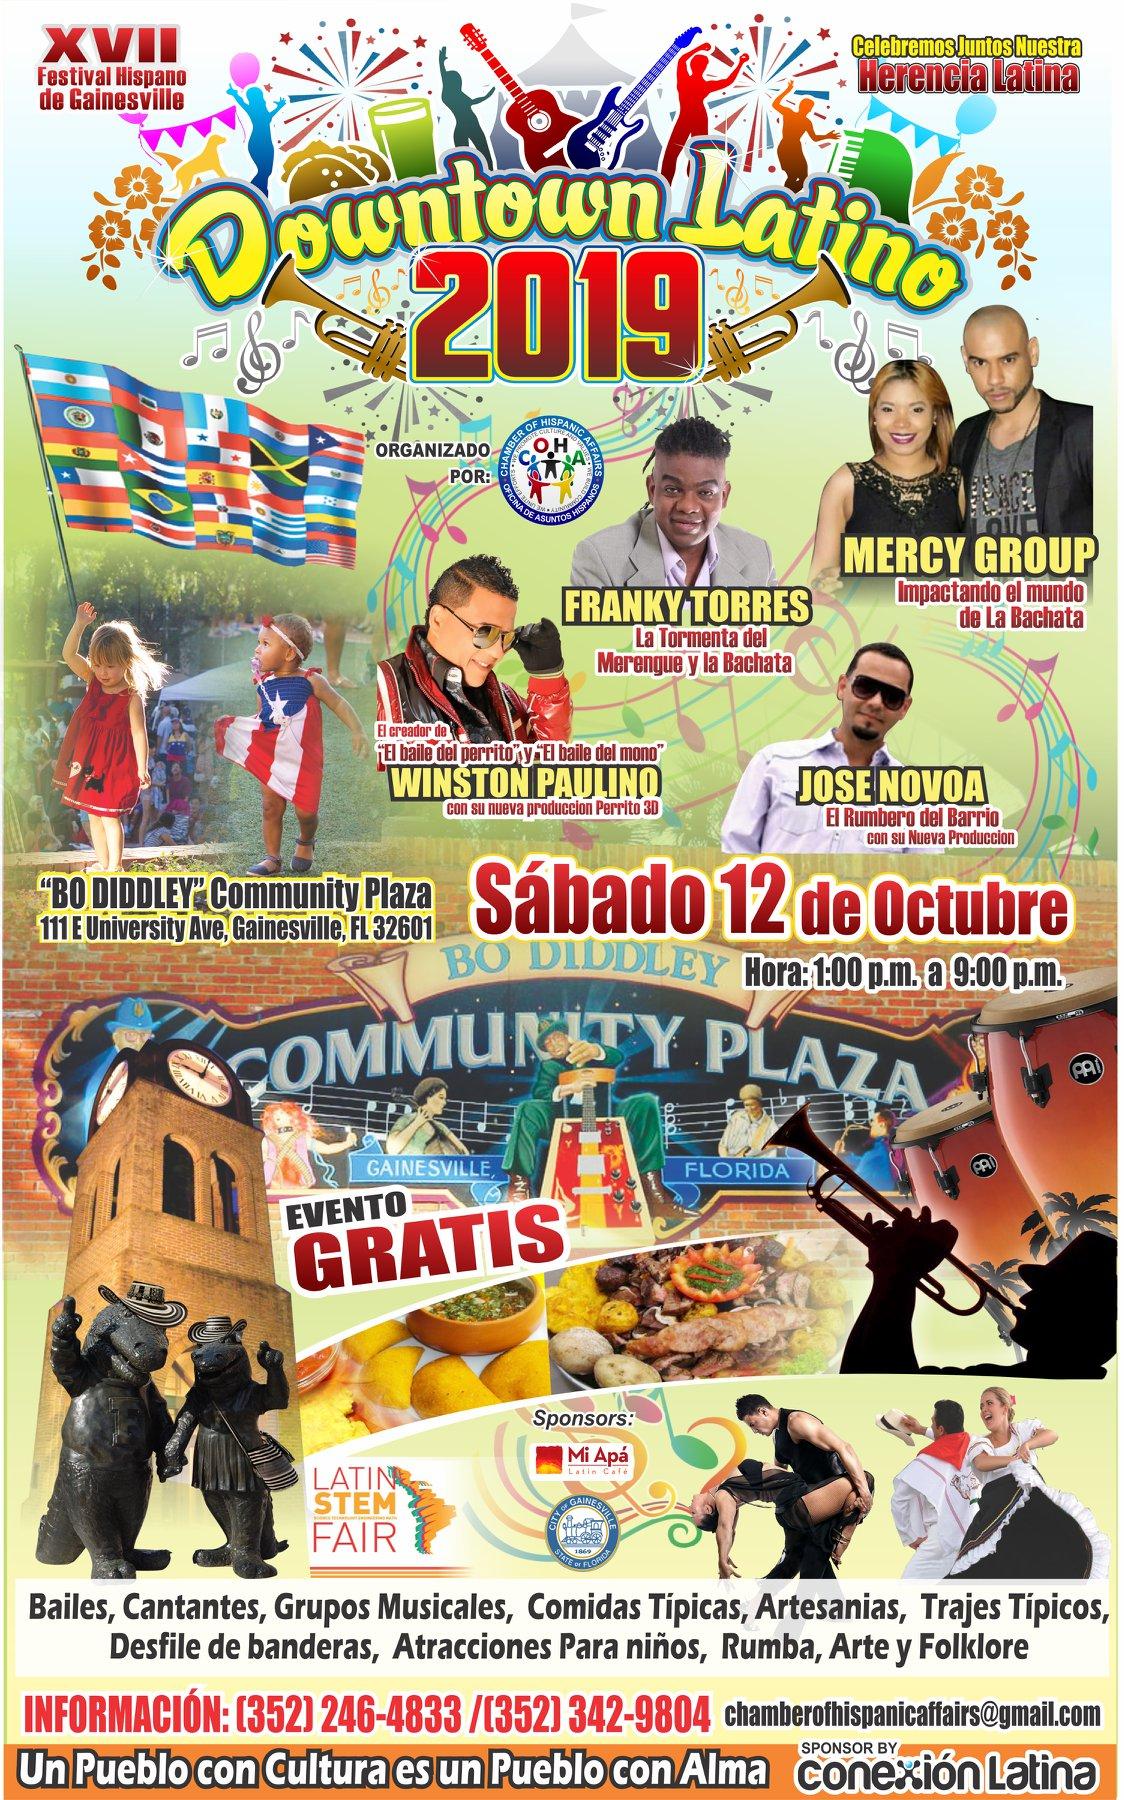 Downtown Latino 2019_Facebook Poster.jpg